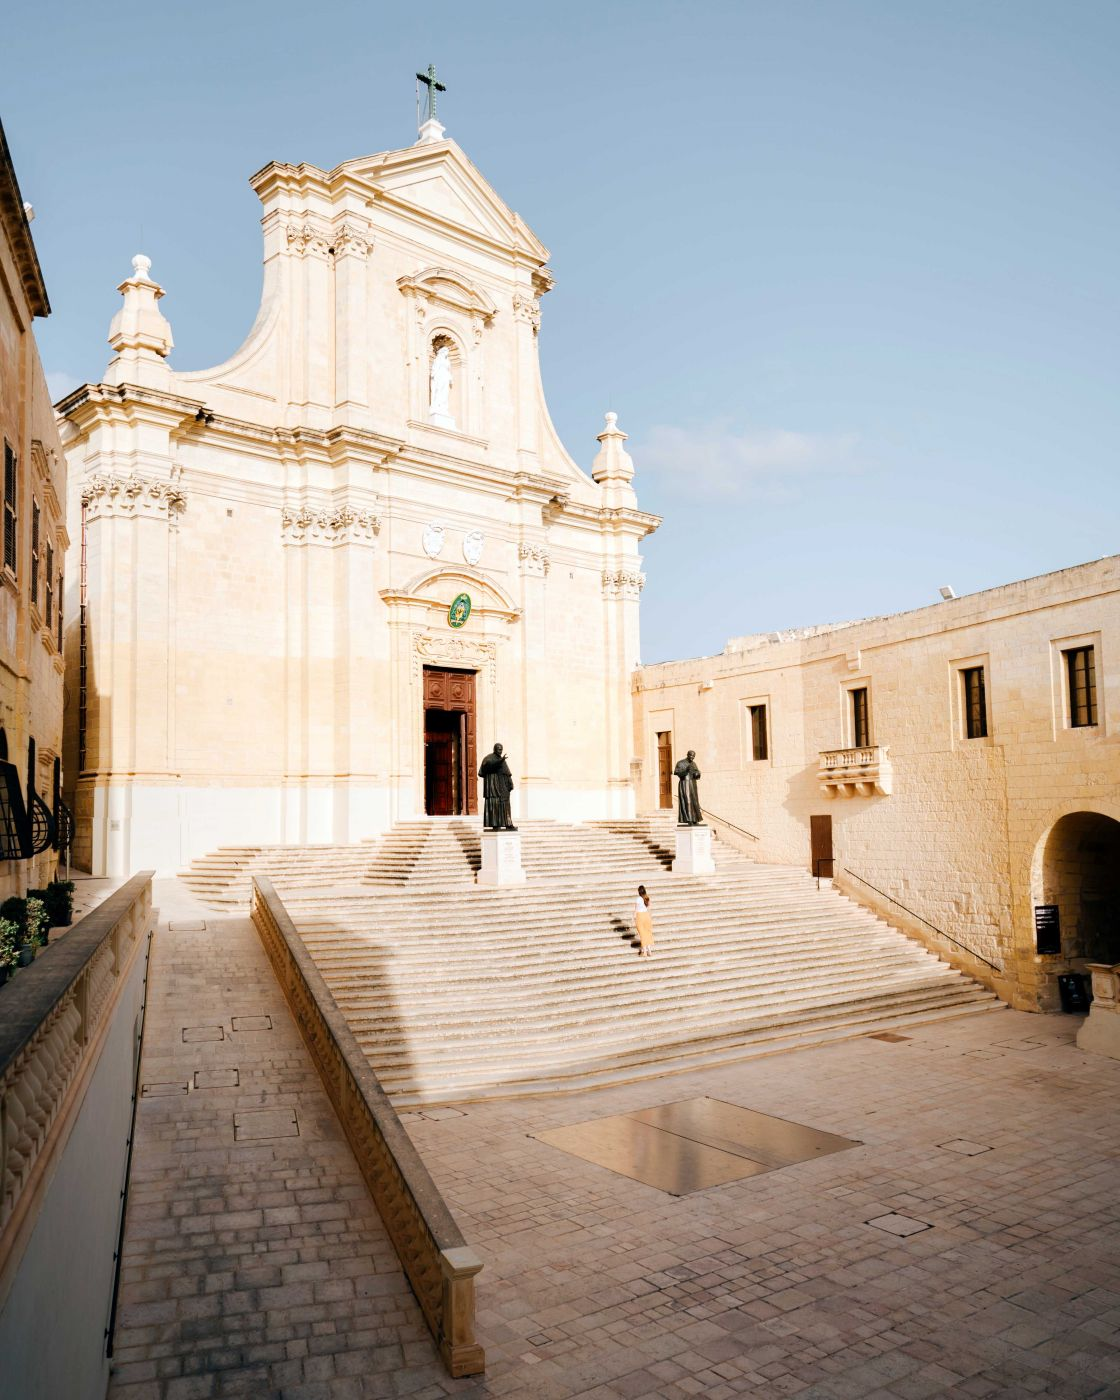 Citadel Gozo, Malta